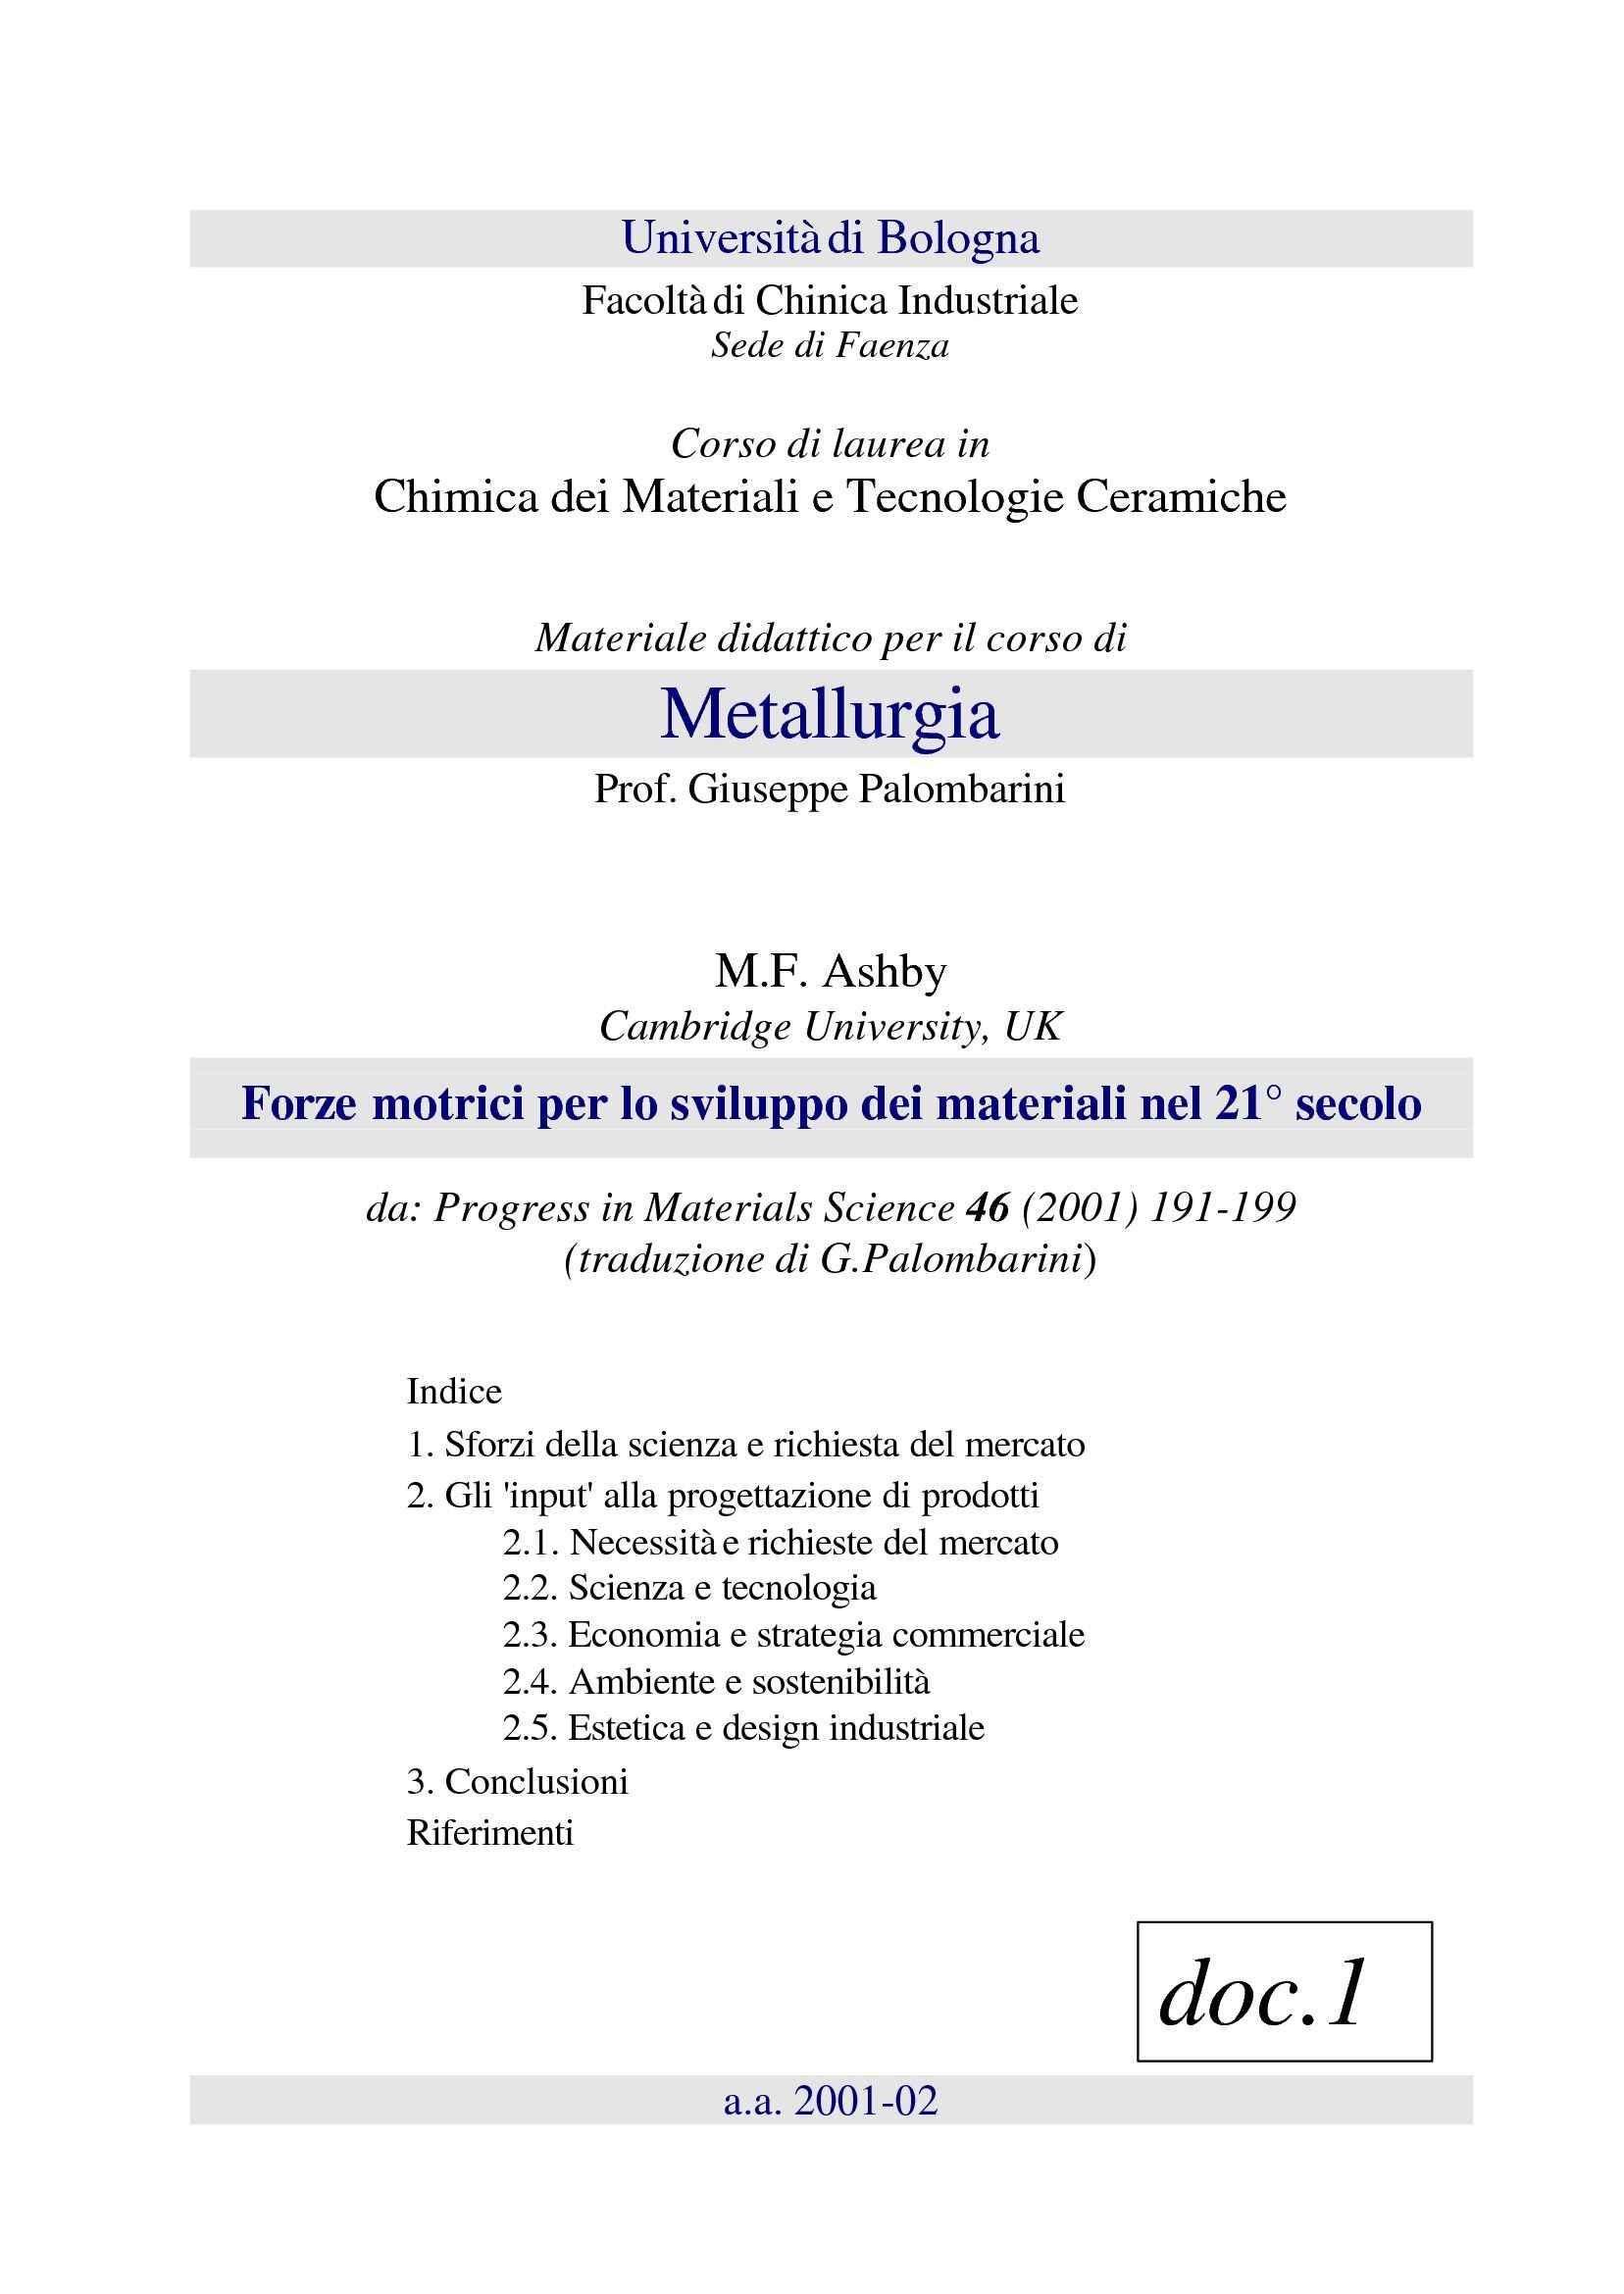 dispensa G. Palombarini Metallurgia